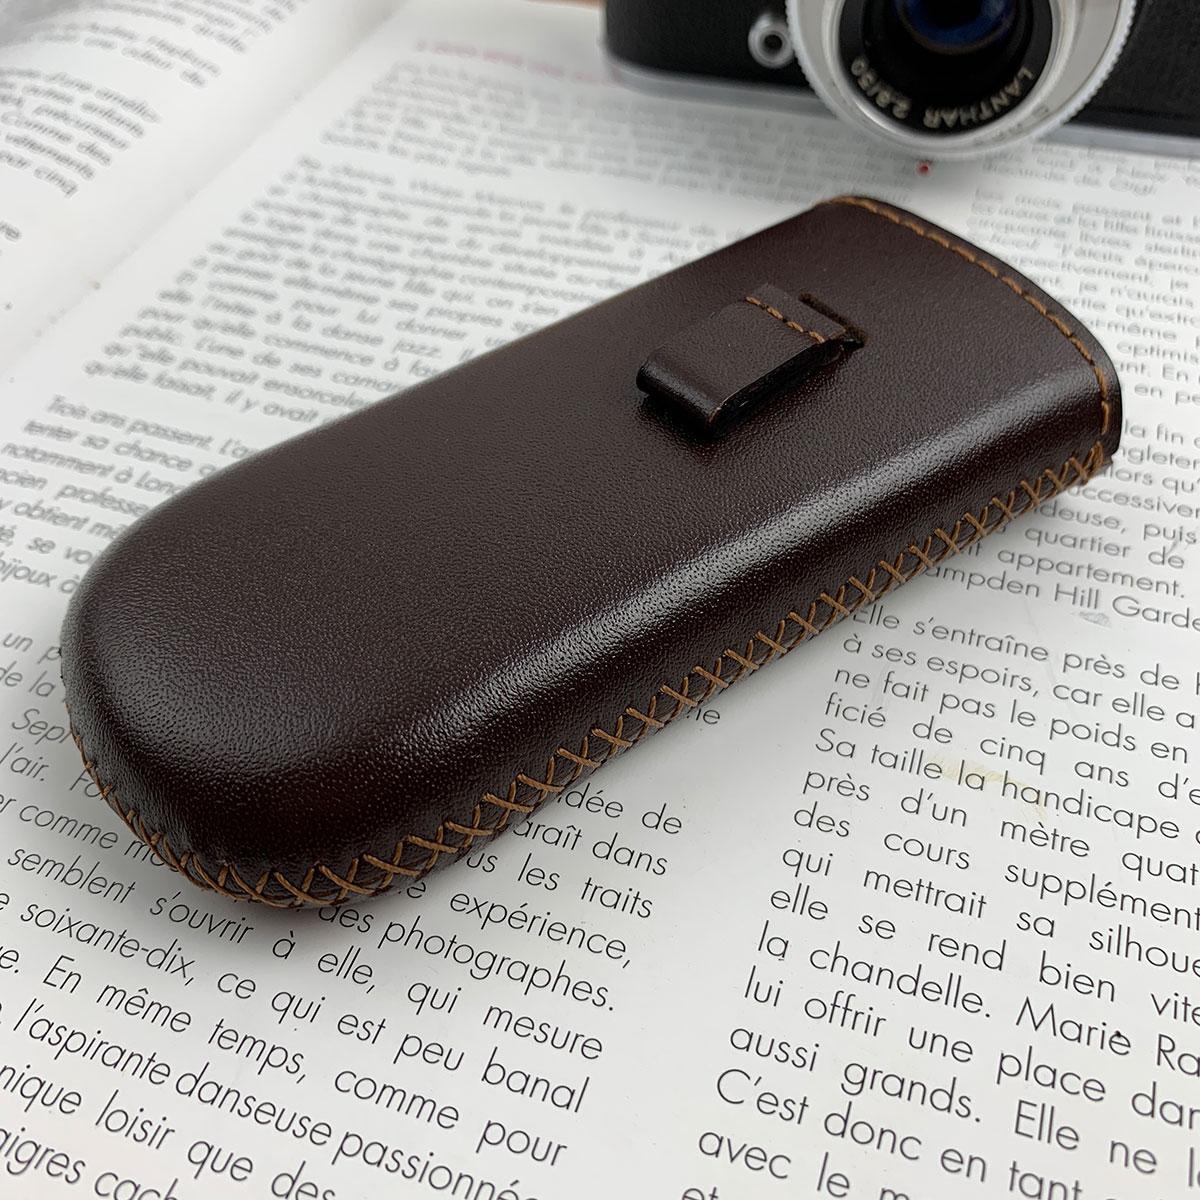 Bao da 6700 - chất liệu da bò thật - màu nâu - handmade MC225